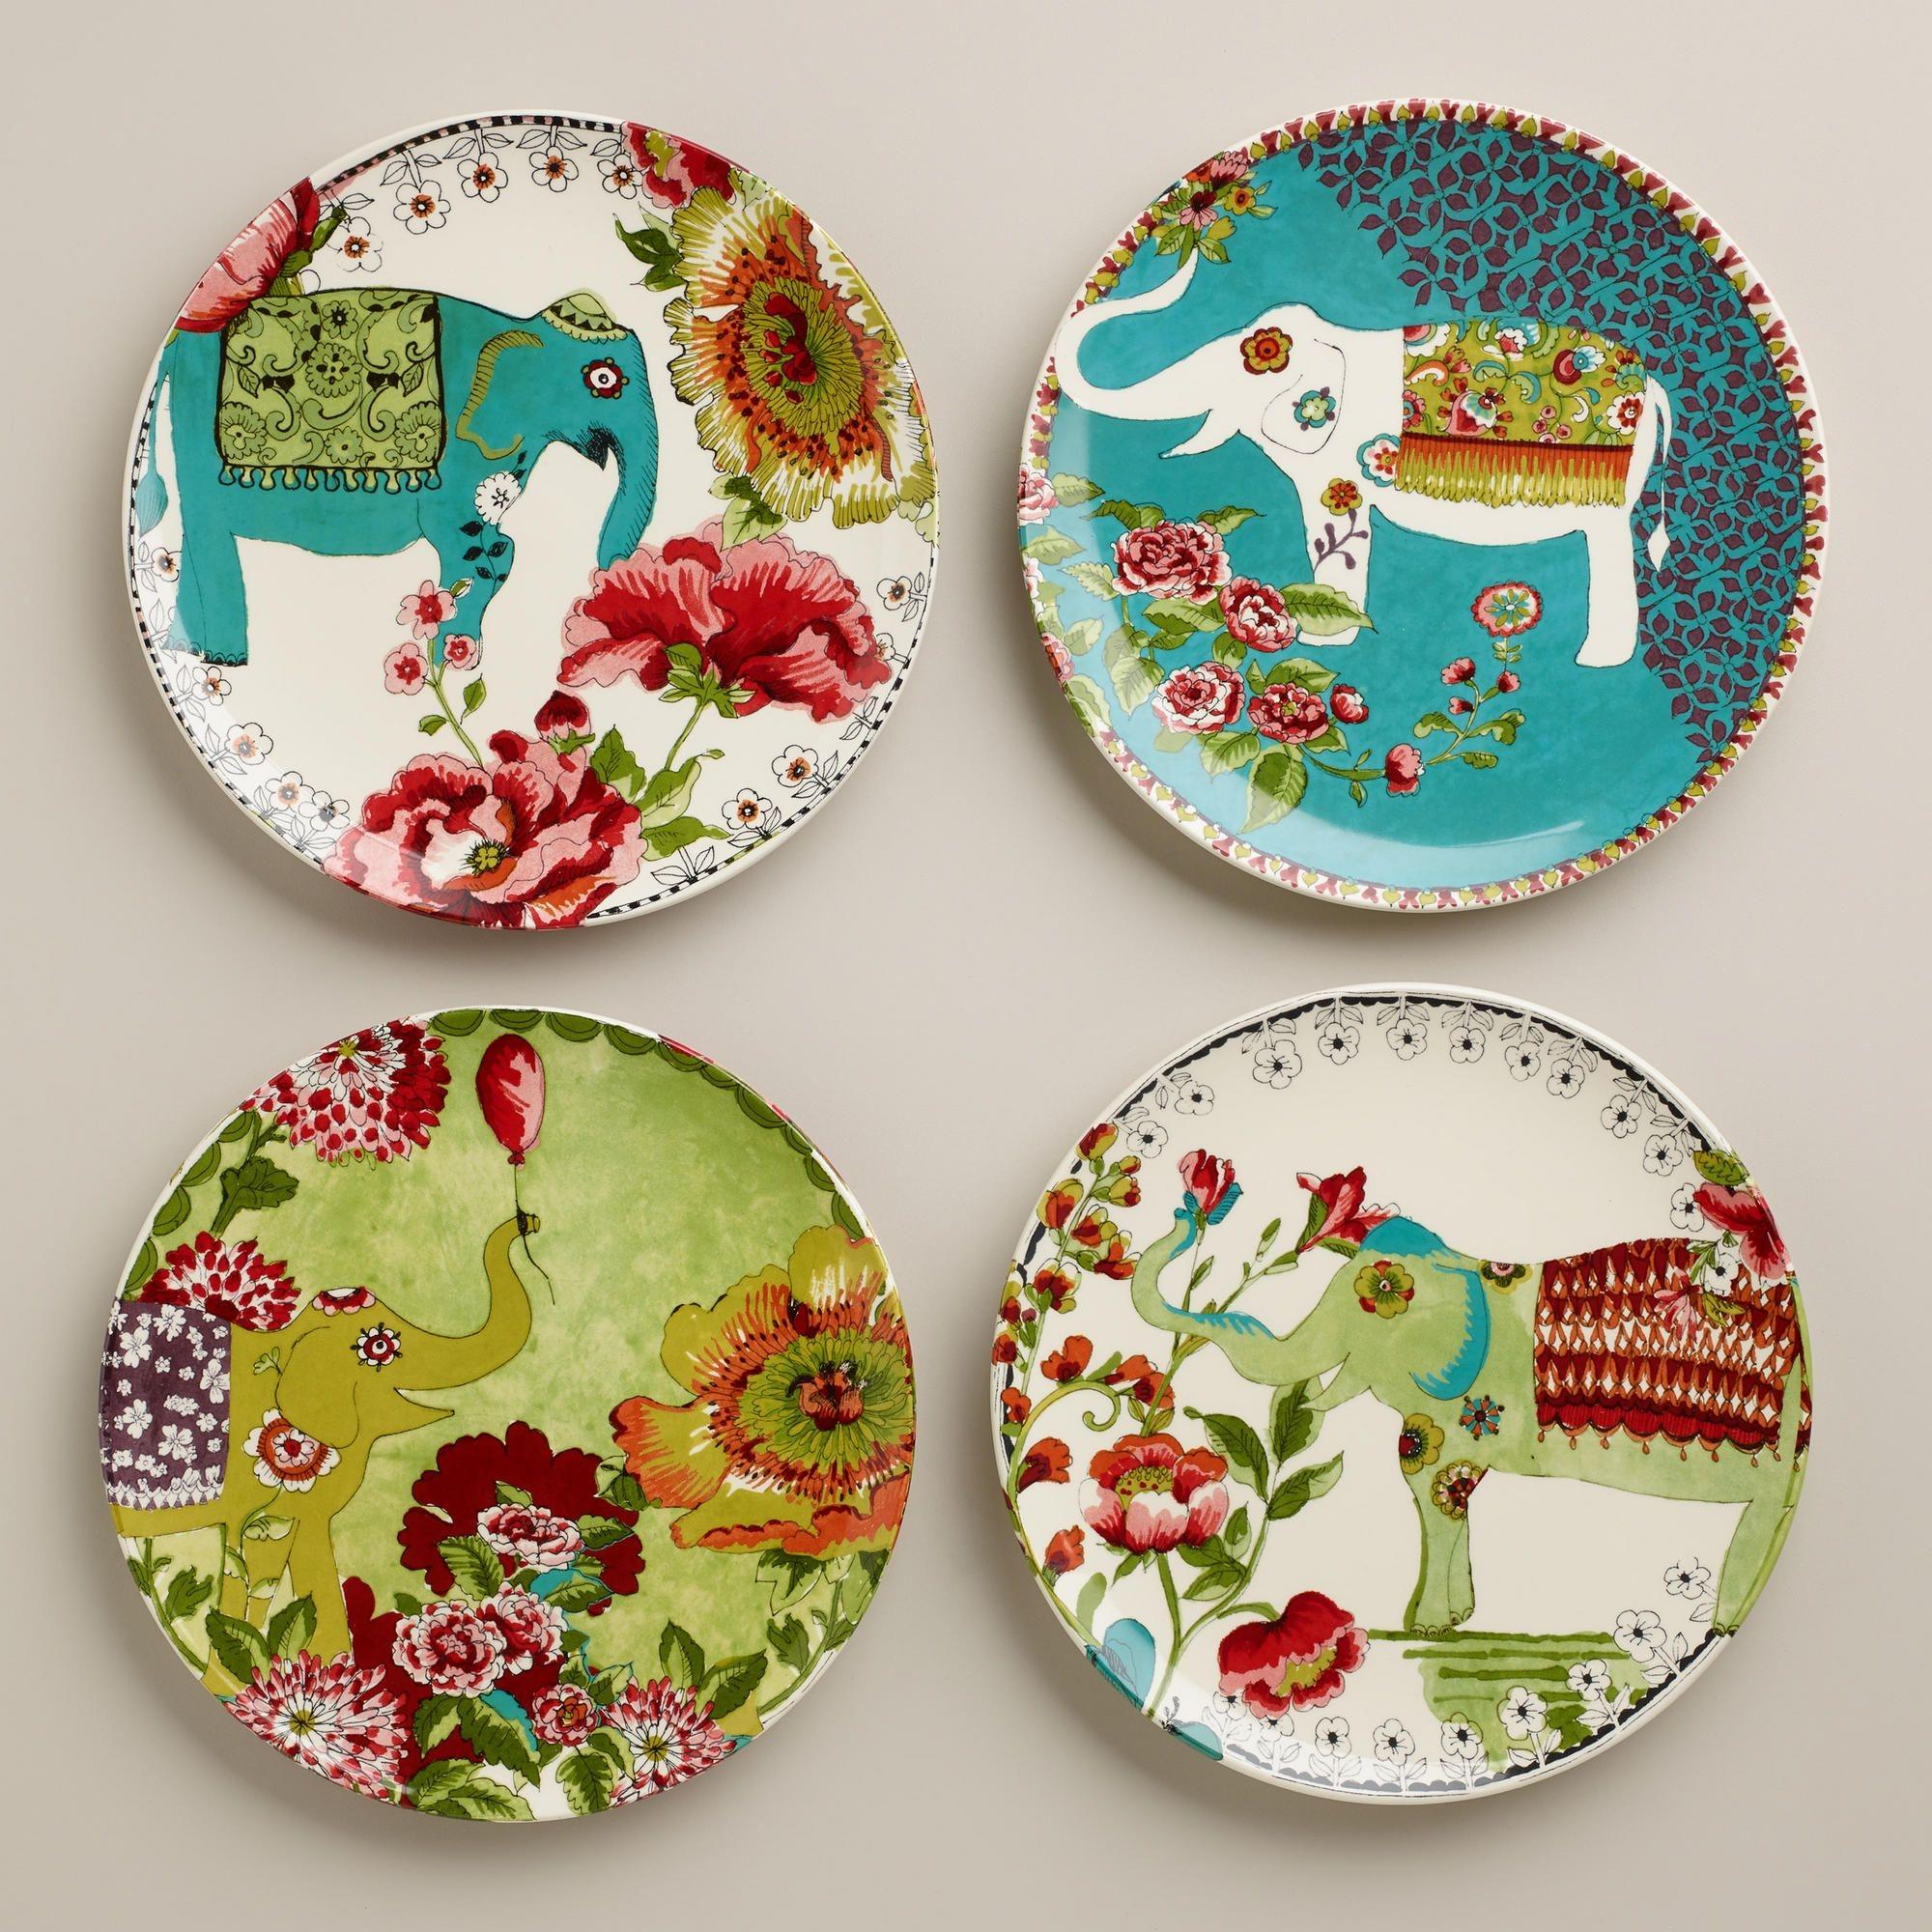 Set of 4 decorative plates 1 & Set Of 4 Decorative Plates - Foter